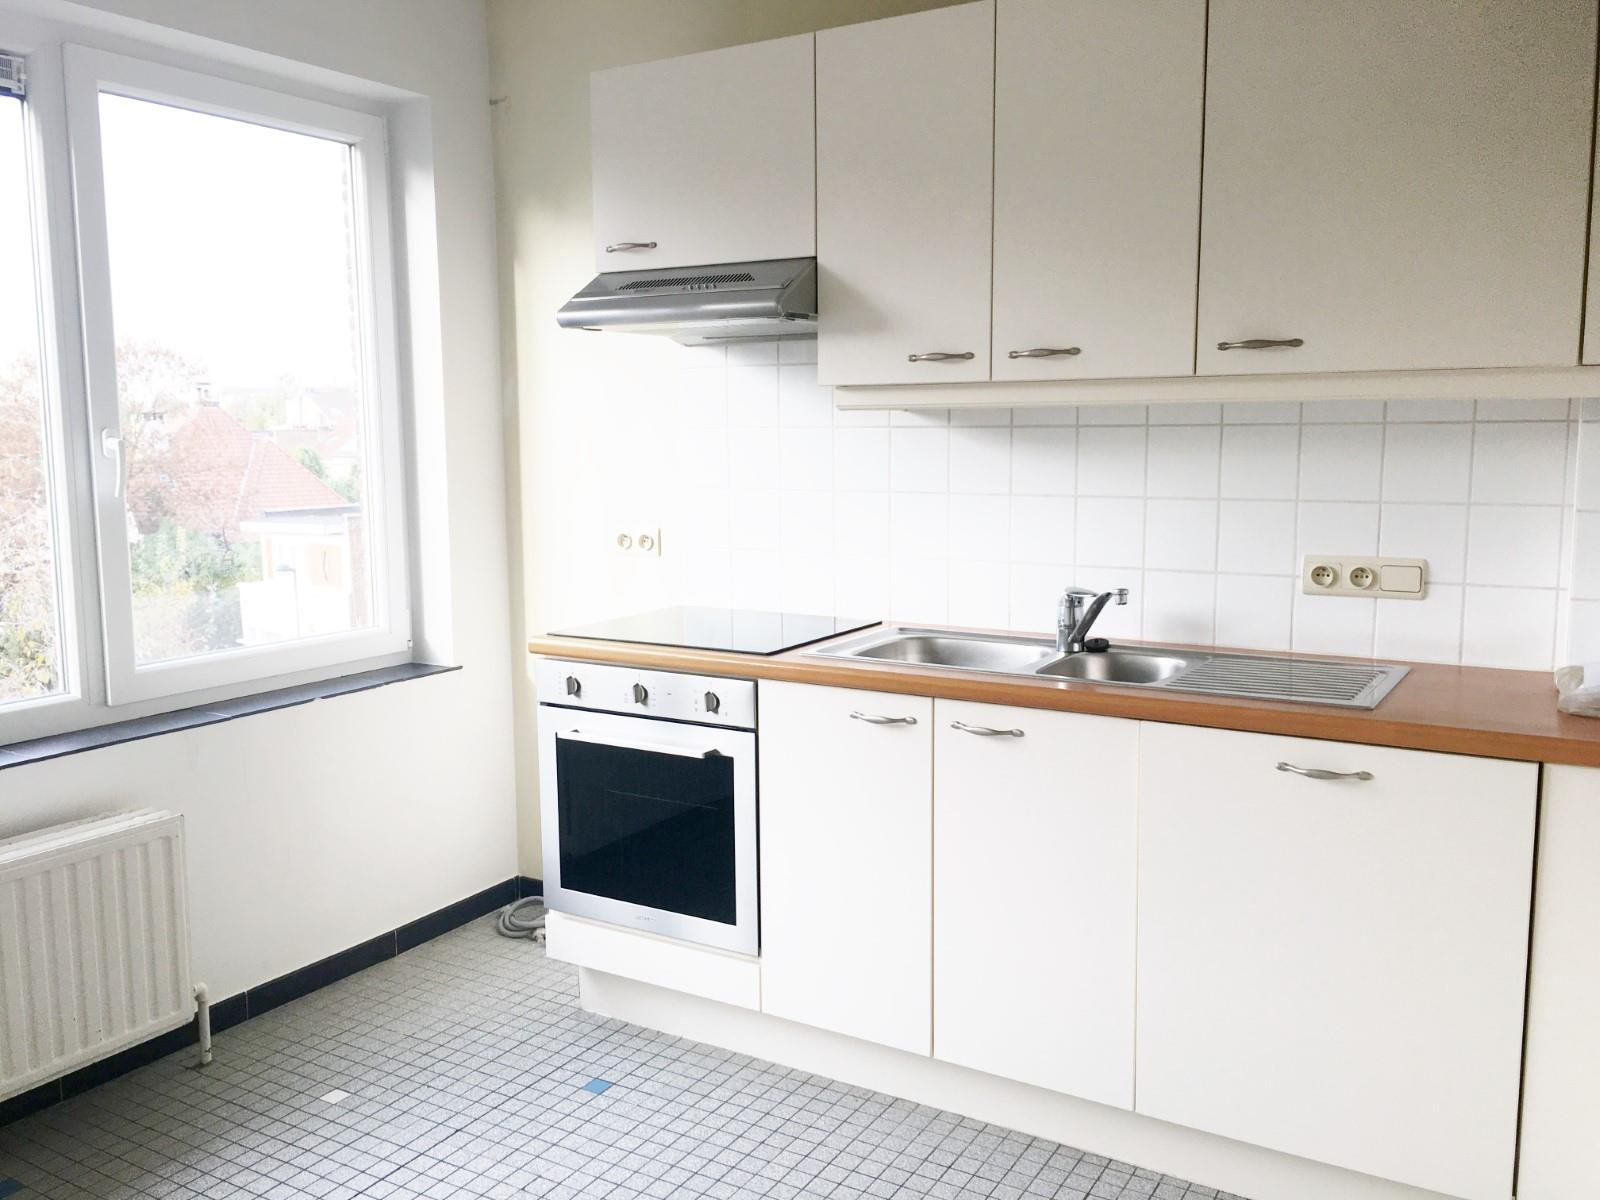 Flat - Auderghem - #3601569-2